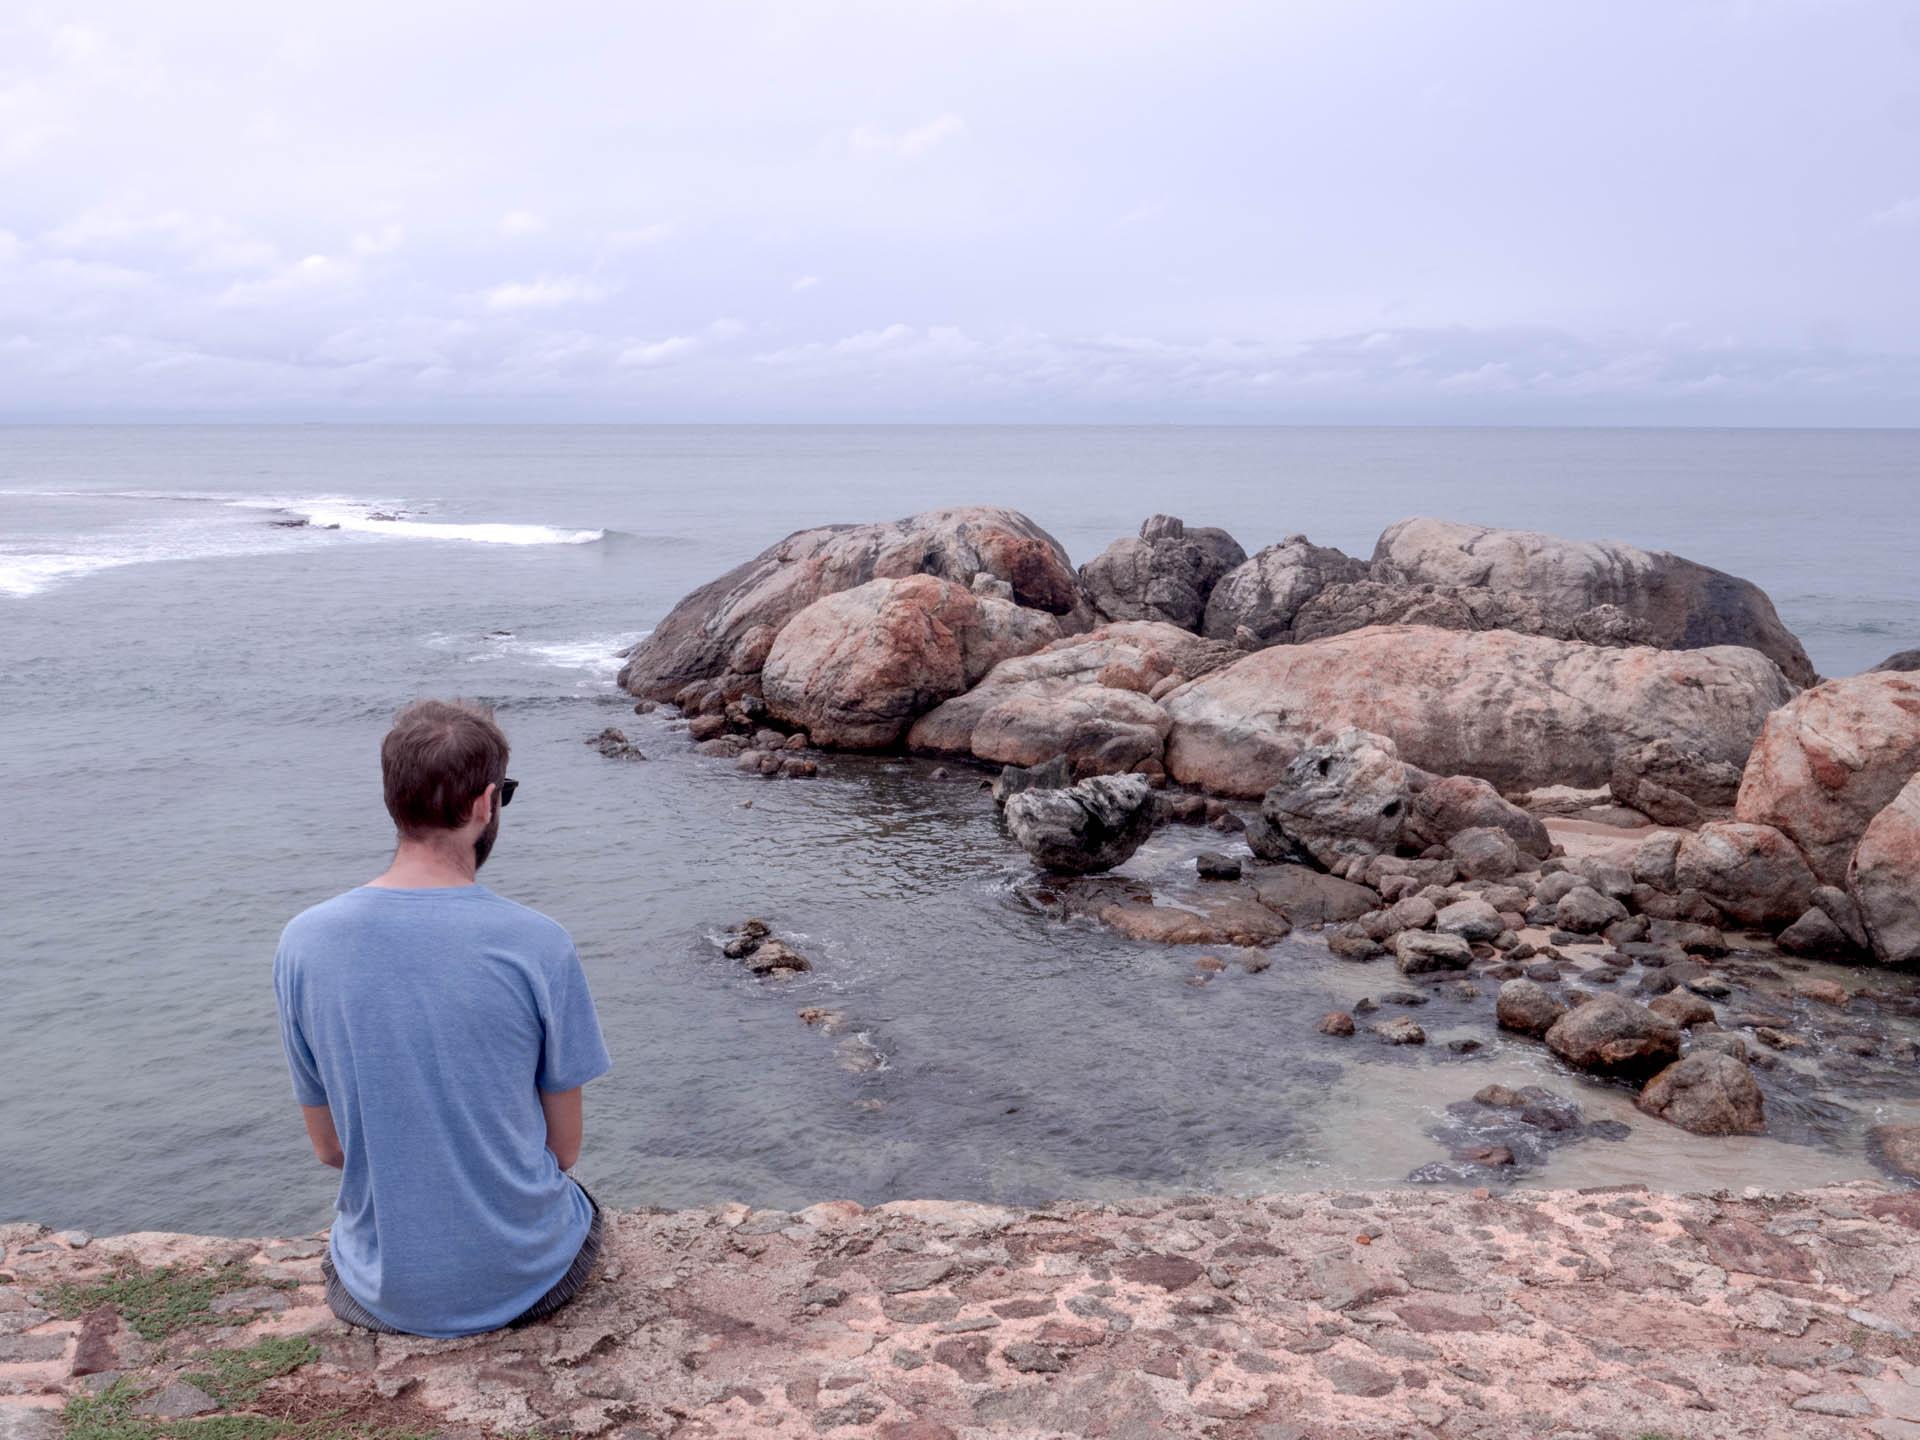 Galle 1 seb mer - Les globe blogueurs - blog voyage nature